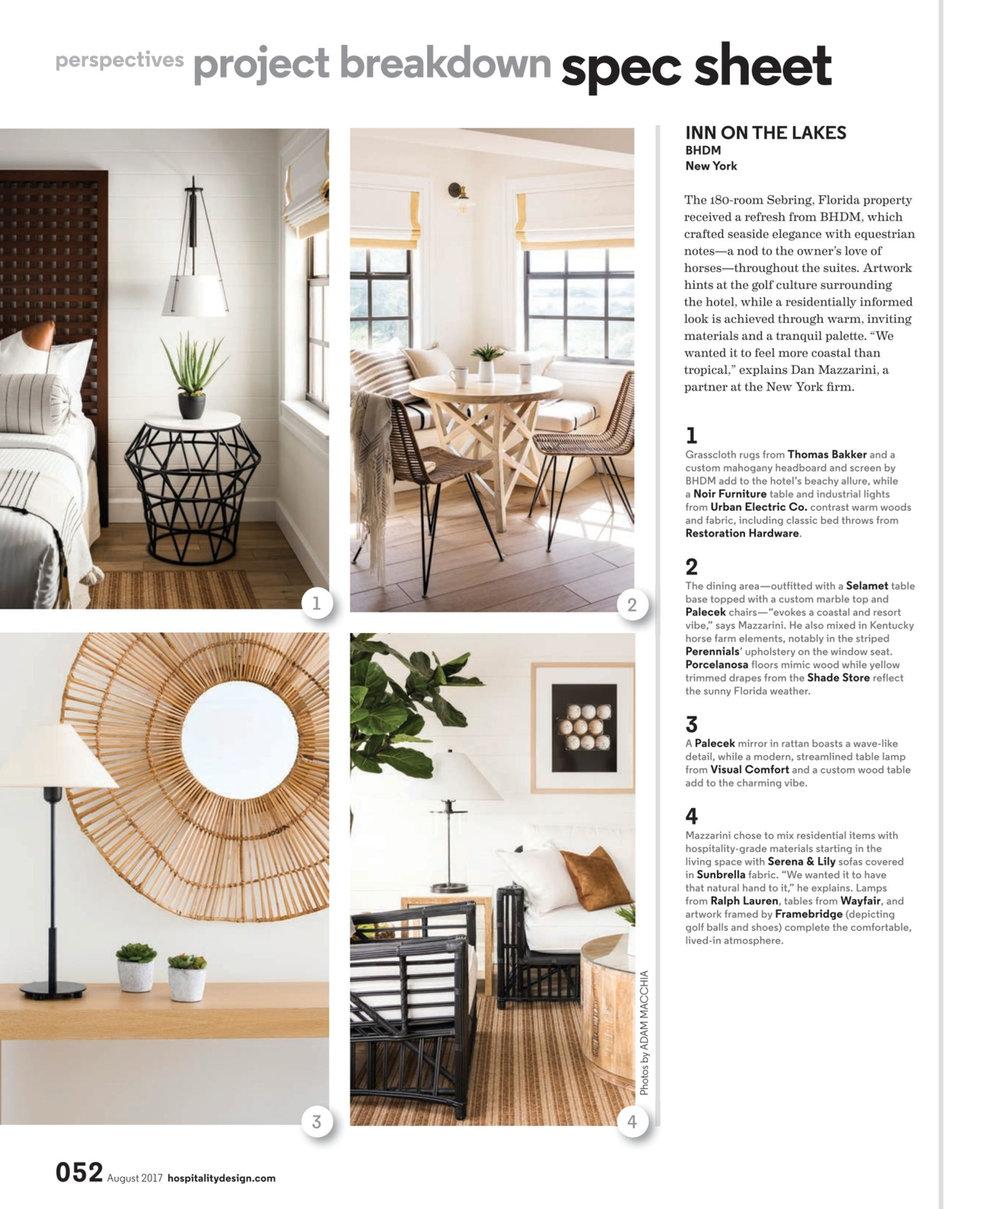 Hospitality Design - August 2017 [52 - 53] SPREAD.jpg